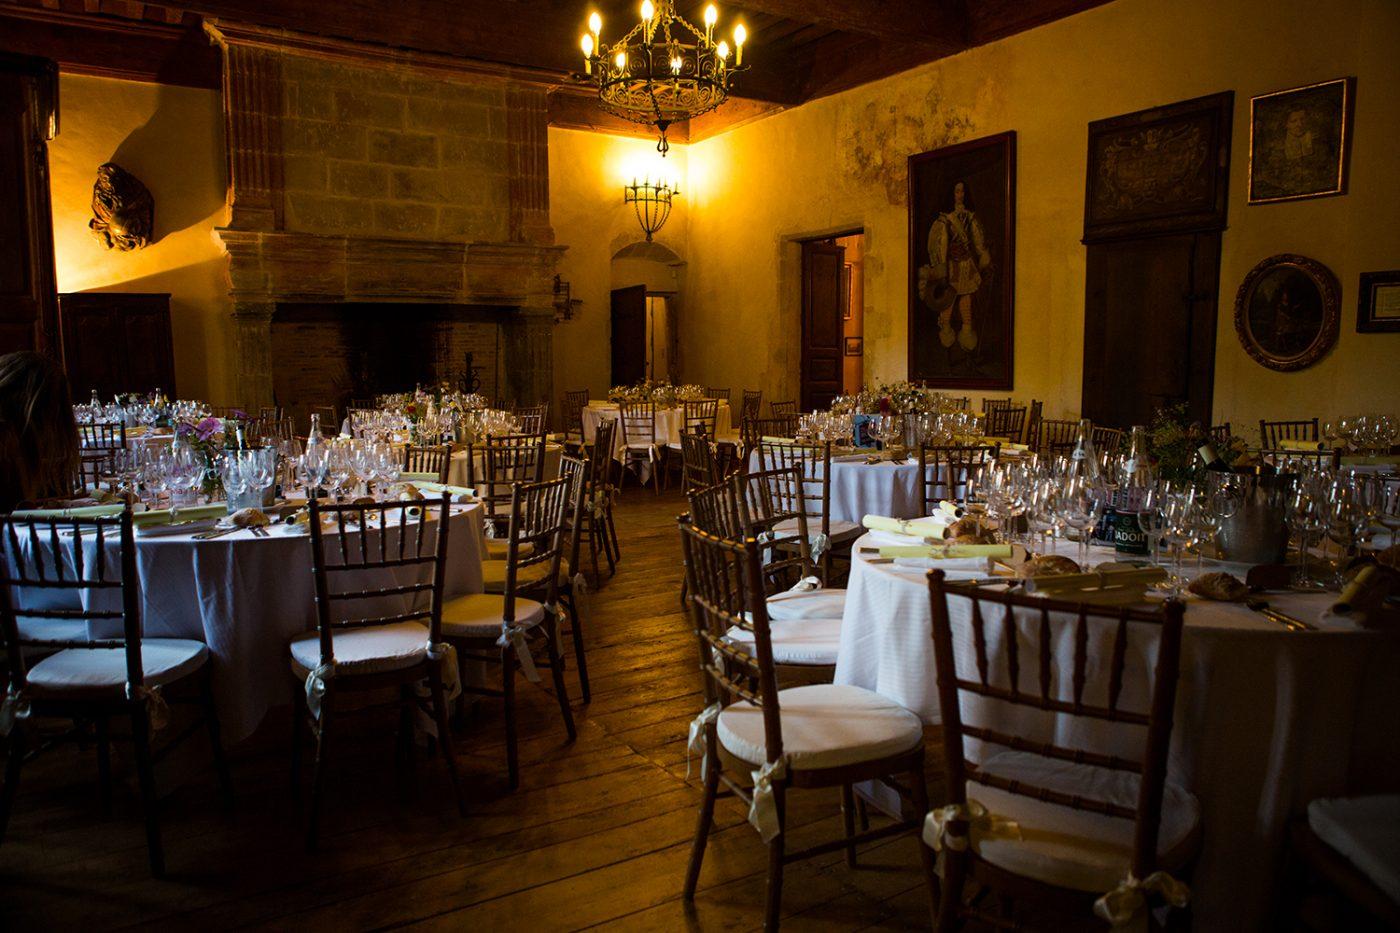 Reception Mariage Salle des Chevaliers / Wedding reception Knights' Hall